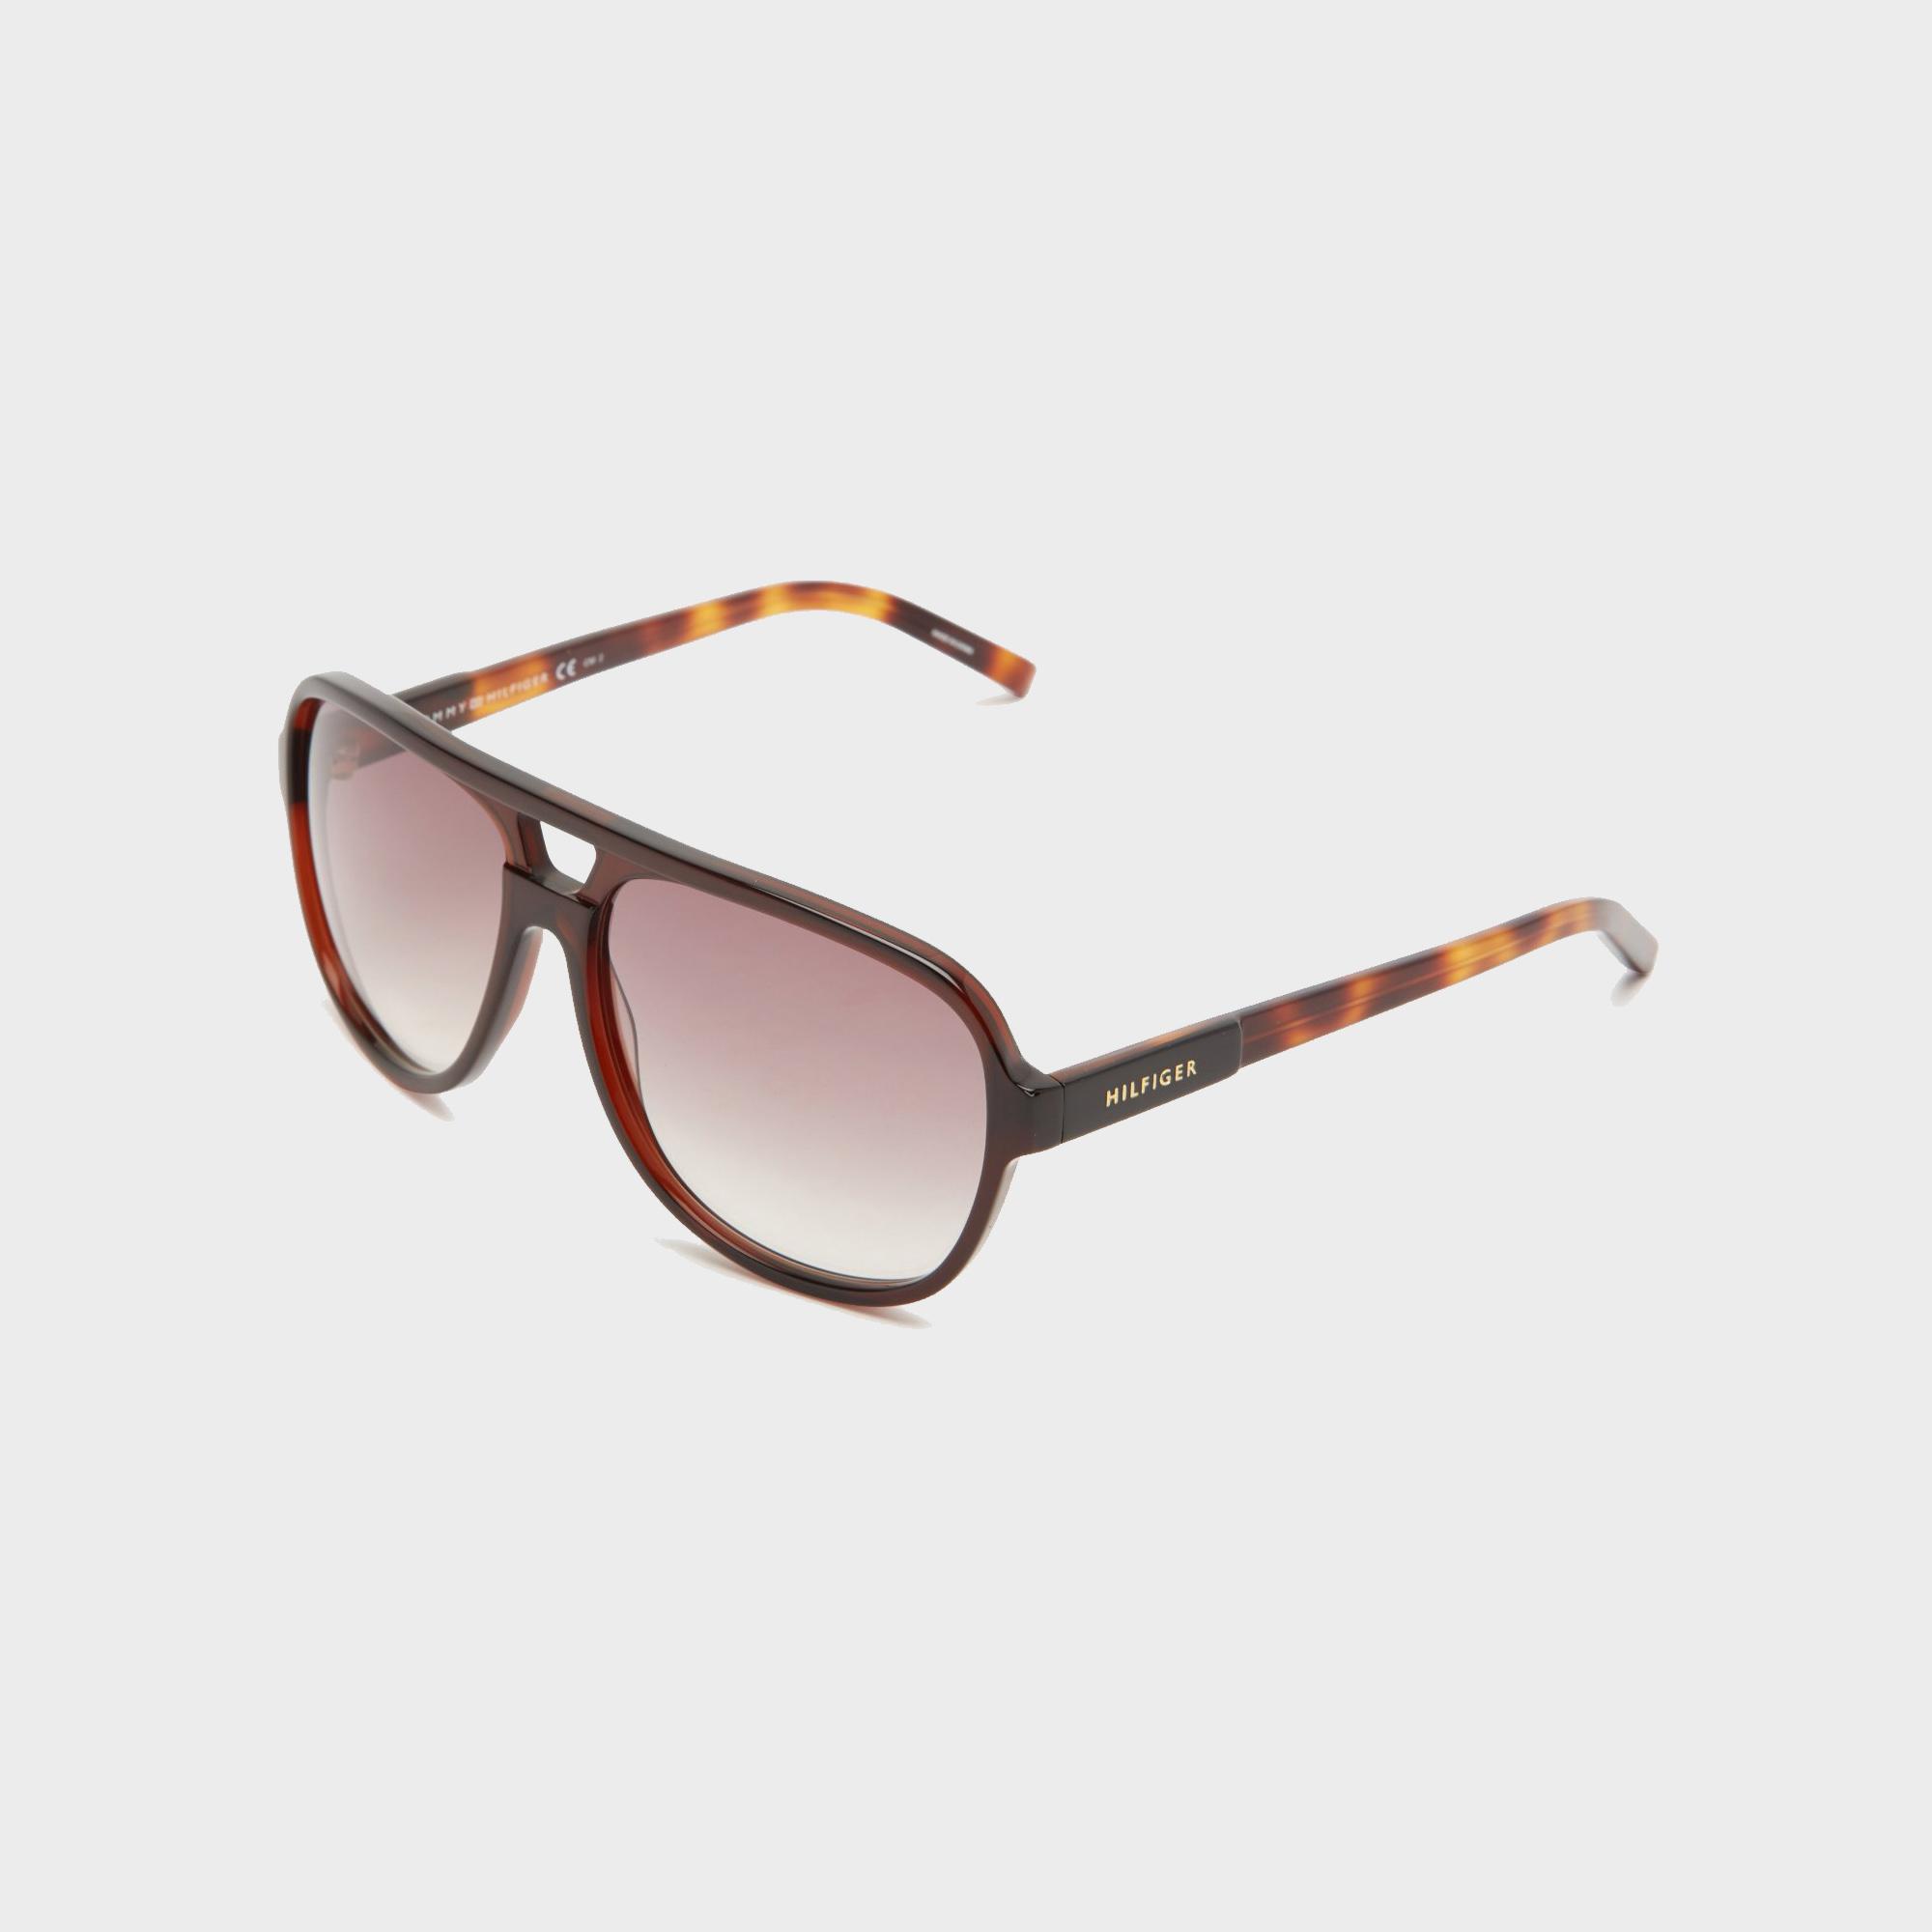 Tommy Hilfiger 1114/N/S Sunglasses